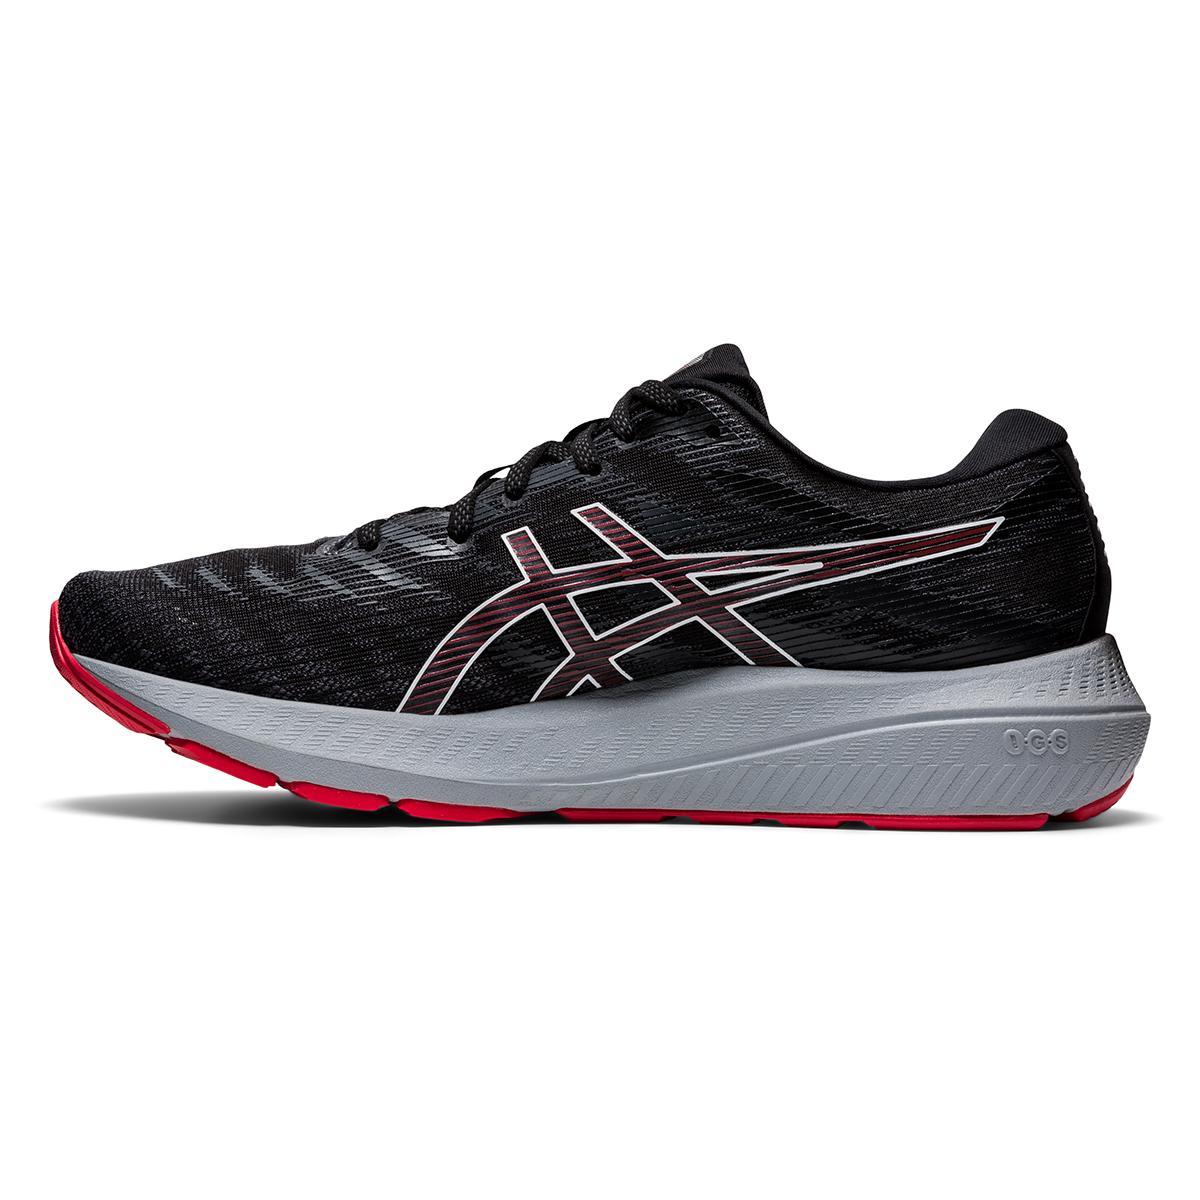 Men's Asics Gel-Kayano Lite 2 Running Shoe - Color: Black/White - Size: 7 - Width: Regular, Black/White, large, image 2